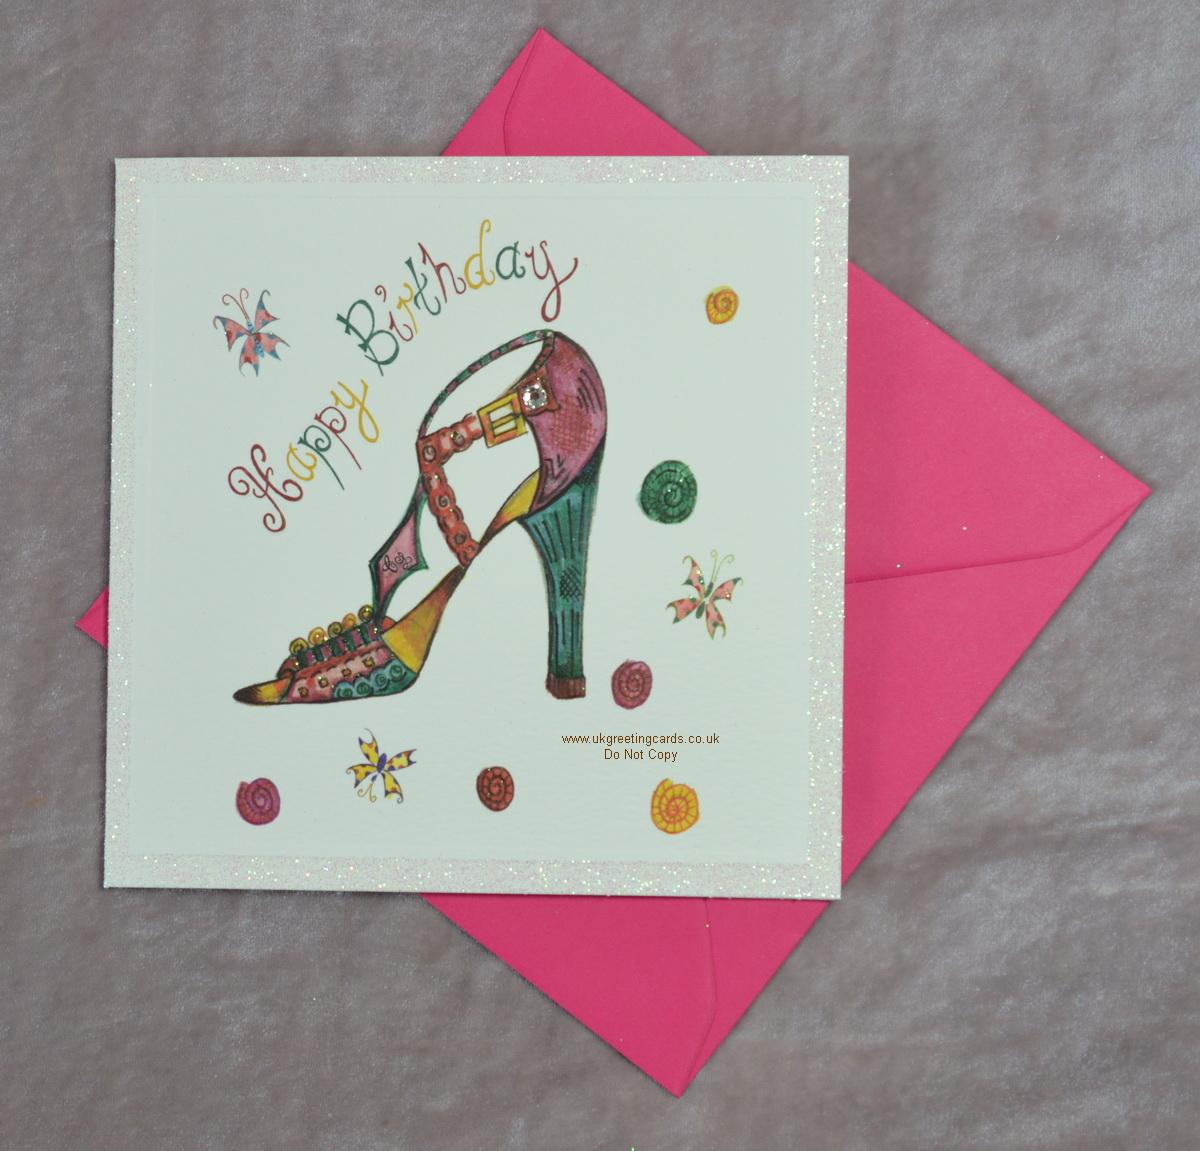 Handmade greeting cards blog birthday cards for women age handmade greeting cards blog birthday cards for women age birthday cards for her kristyandbryce Images